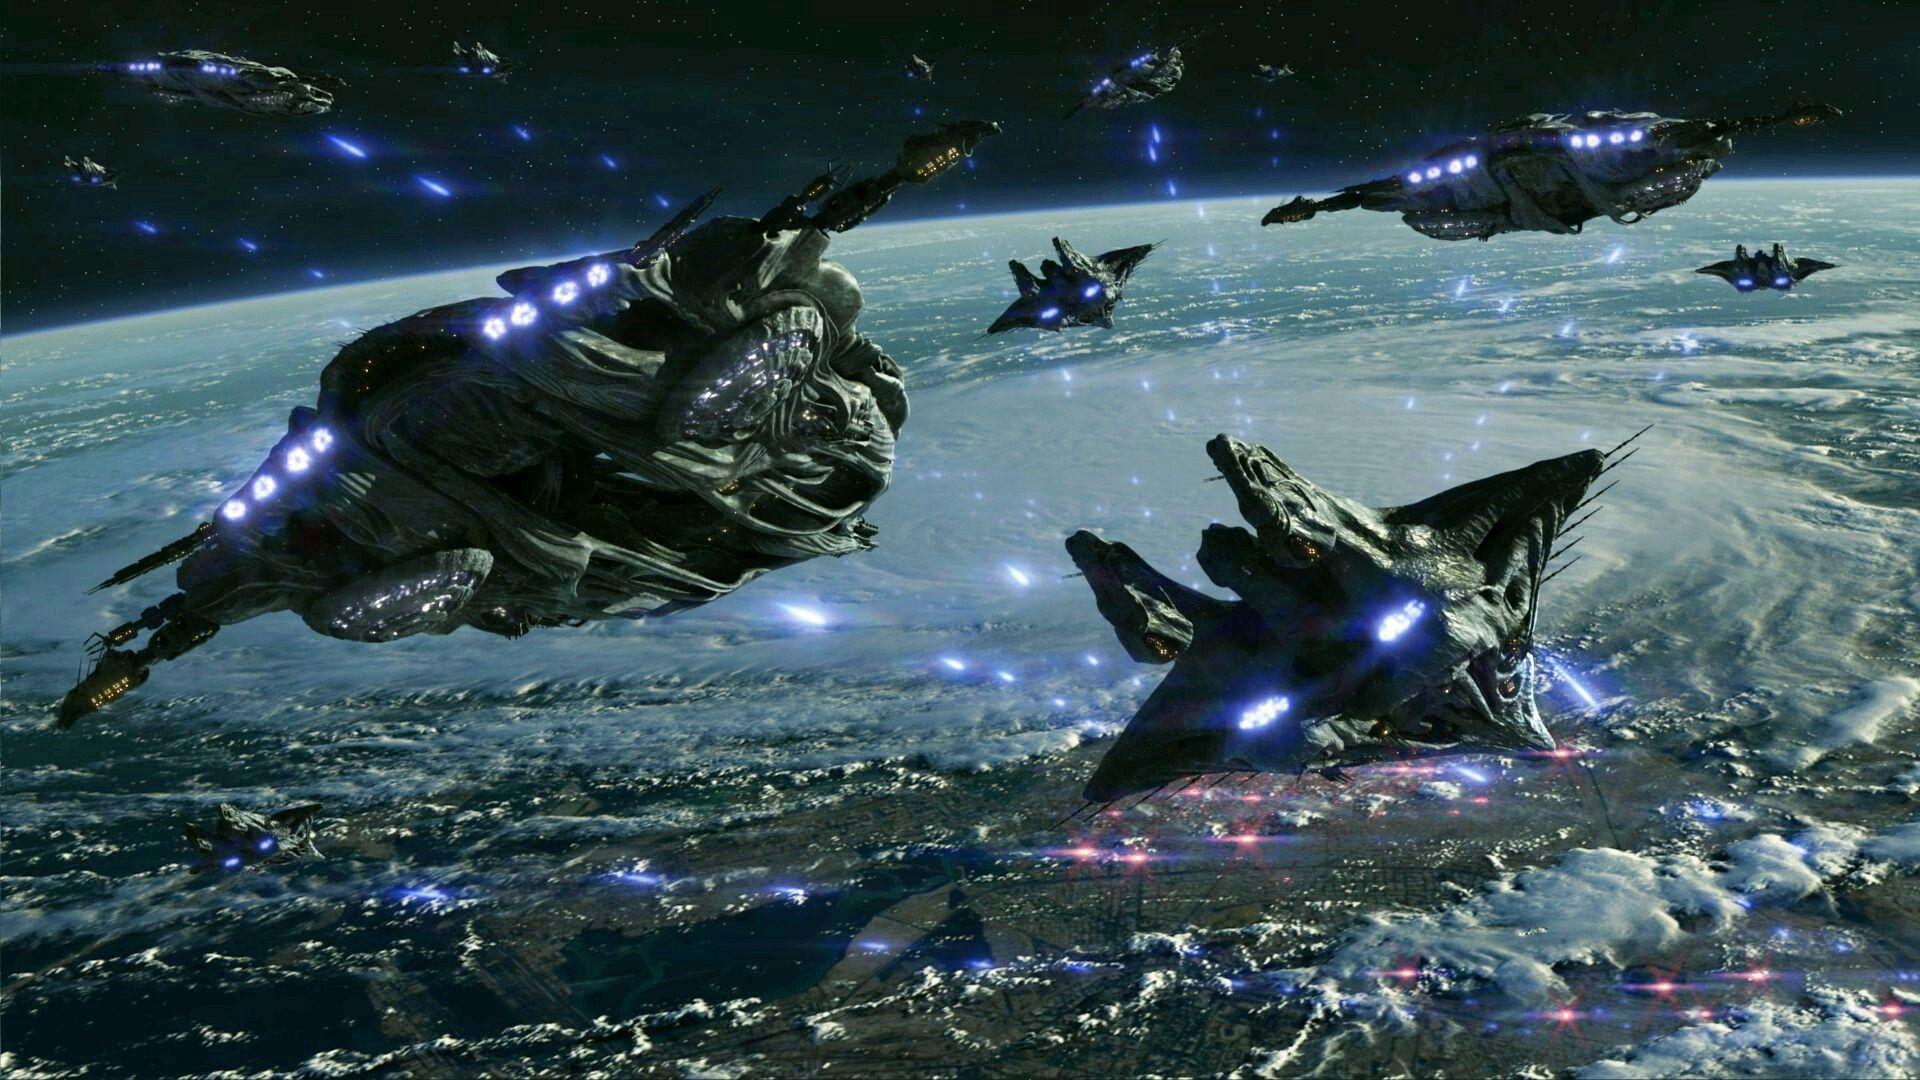 Daedalus   Stargate ships, Stargate, Stargate universe